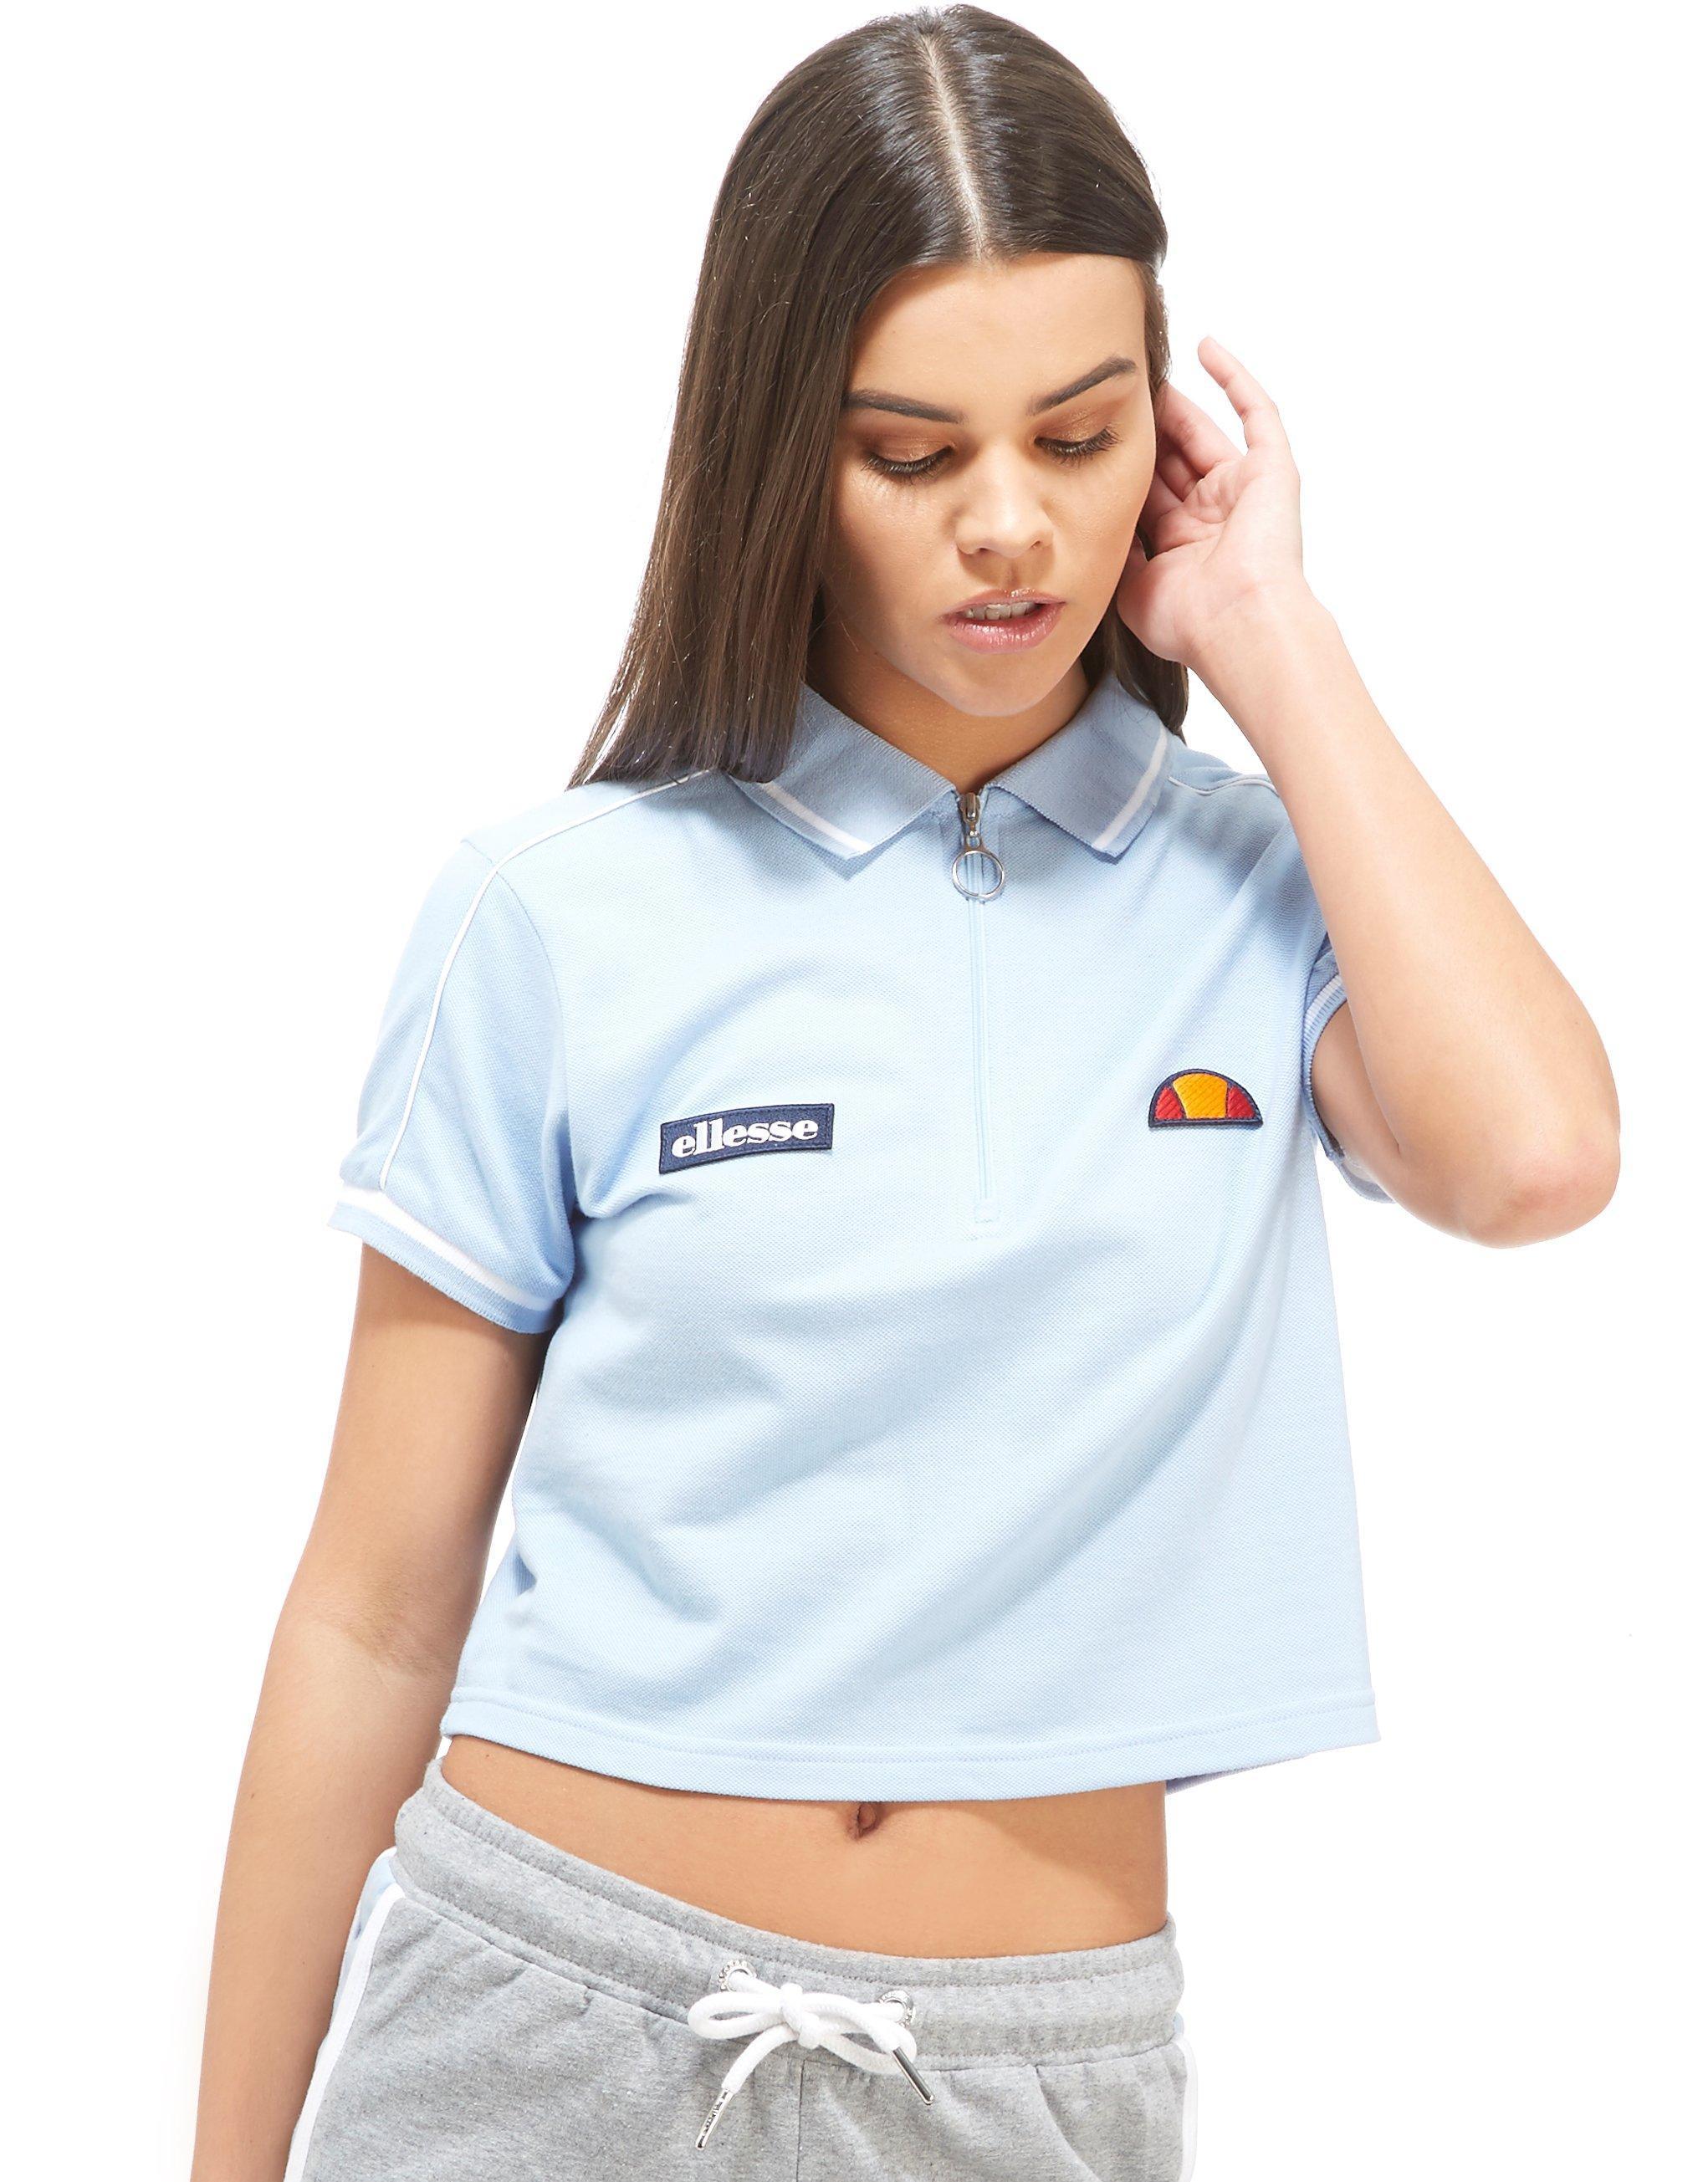 9fba0735c3 Ellesse Blue Crop Zip Polo Shirt